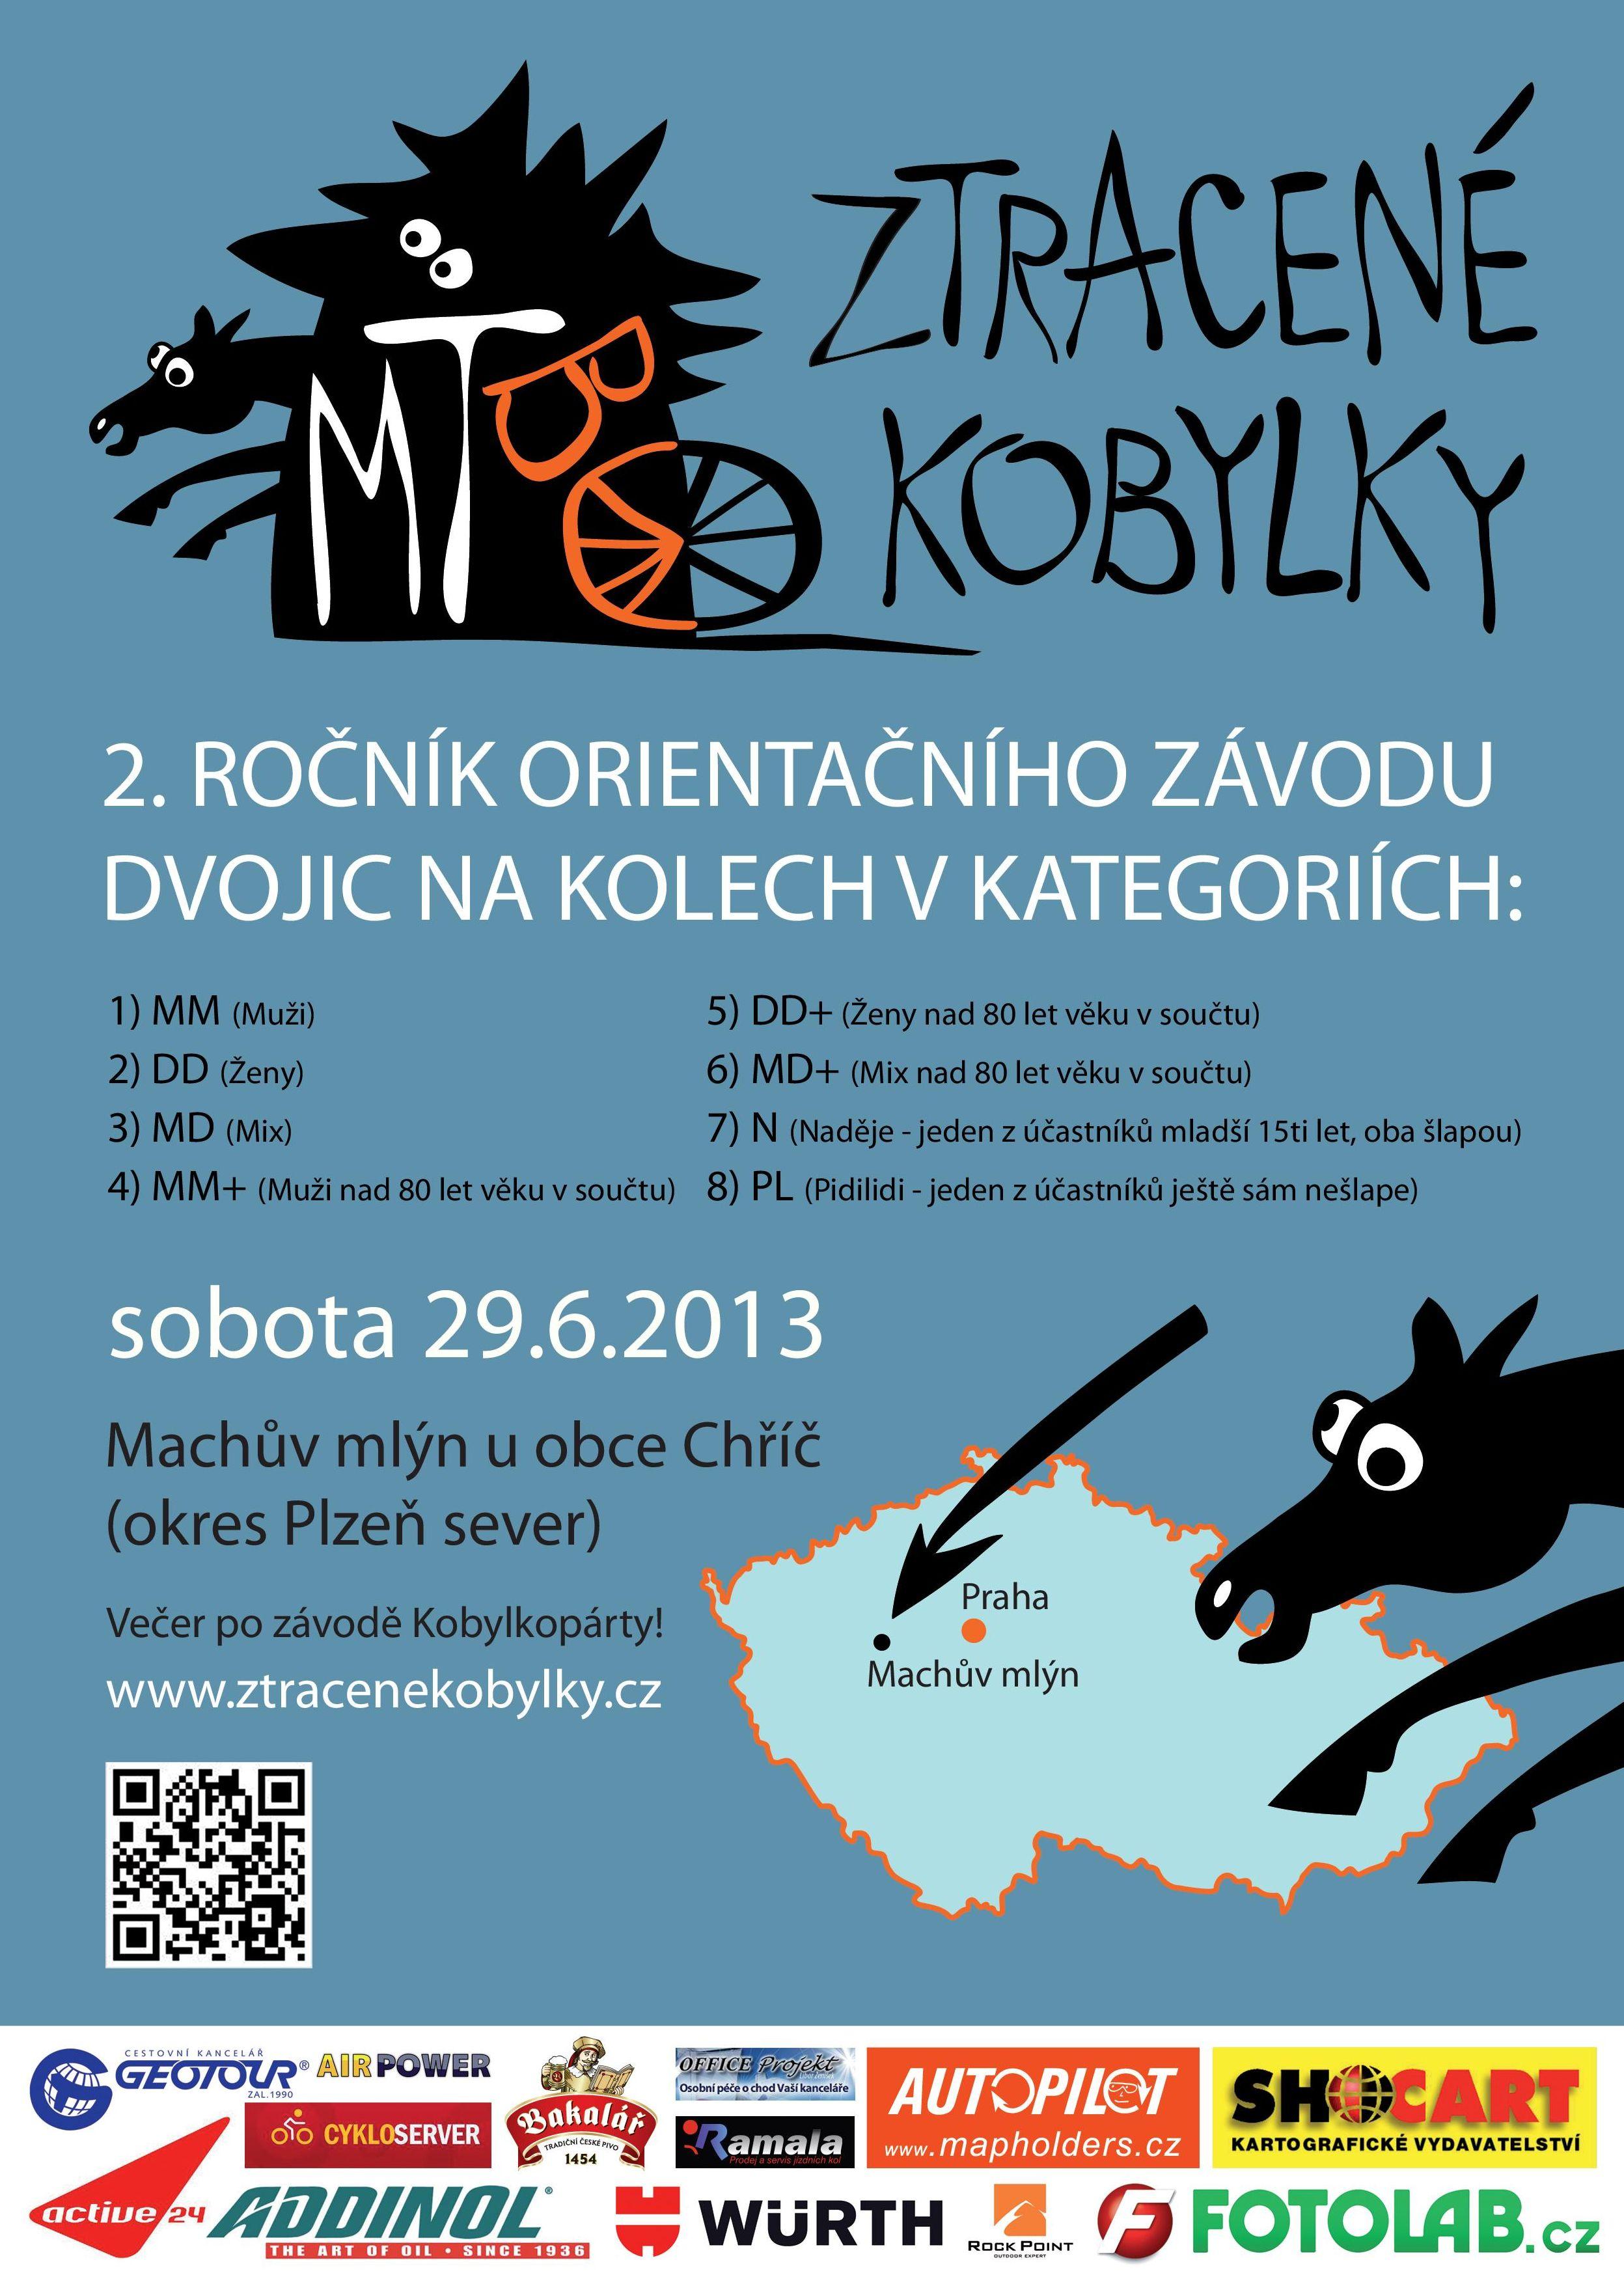 plakat_ztracene kobylky_2013_bez_okraje